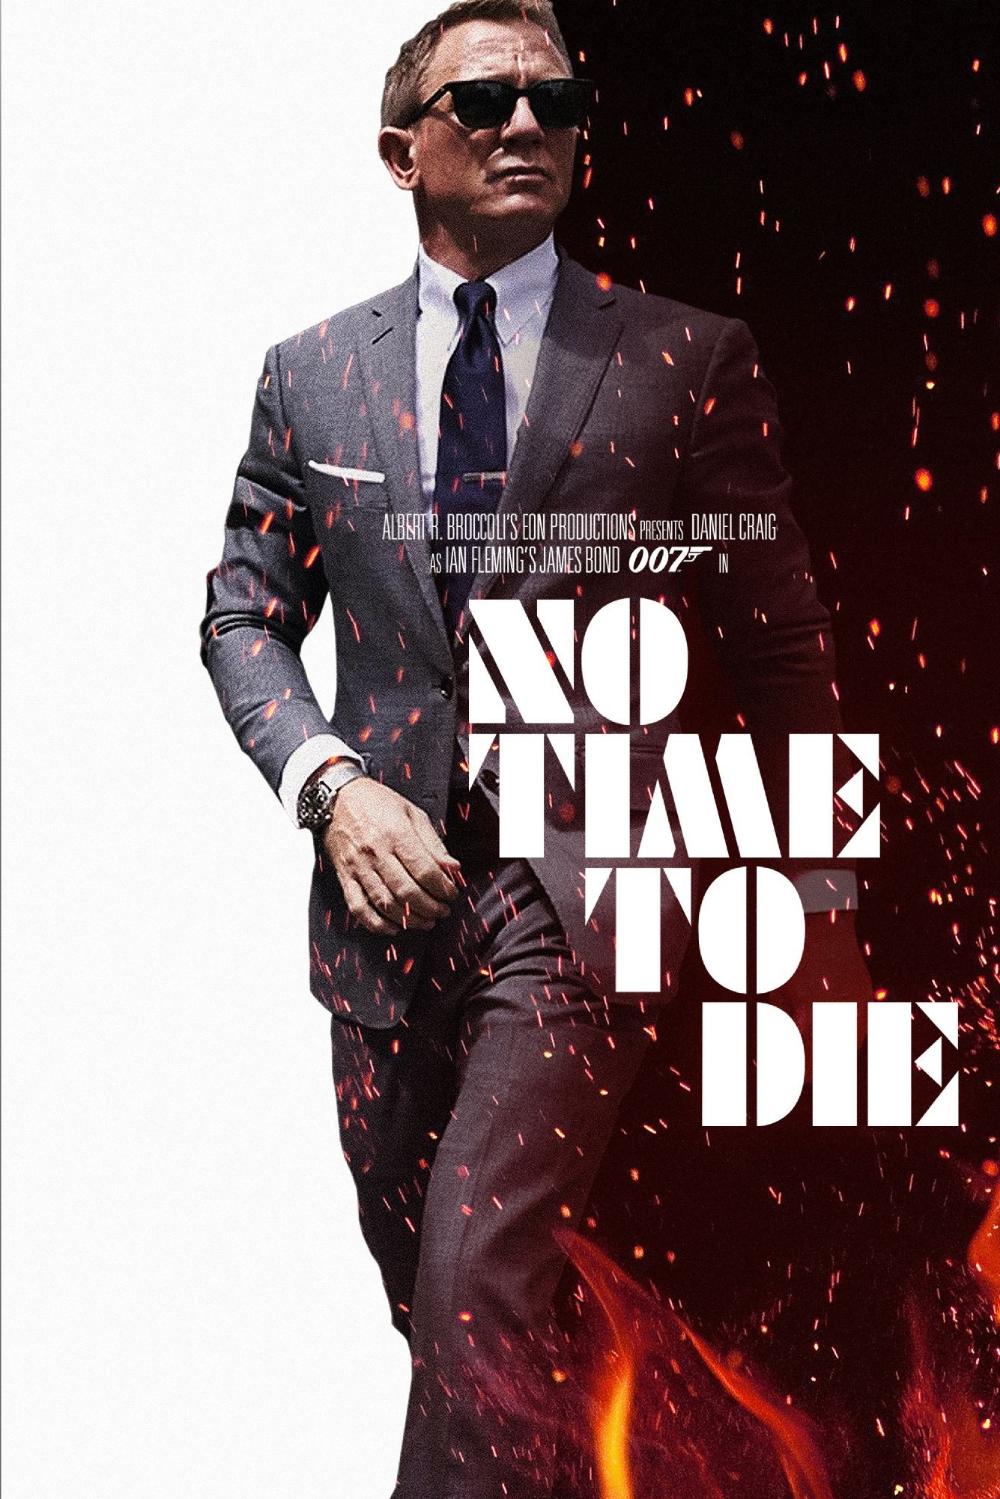 Sintiempoparamorir Jamesbond Timetodie James Bond Movie Posters James Bond James Bond Theme